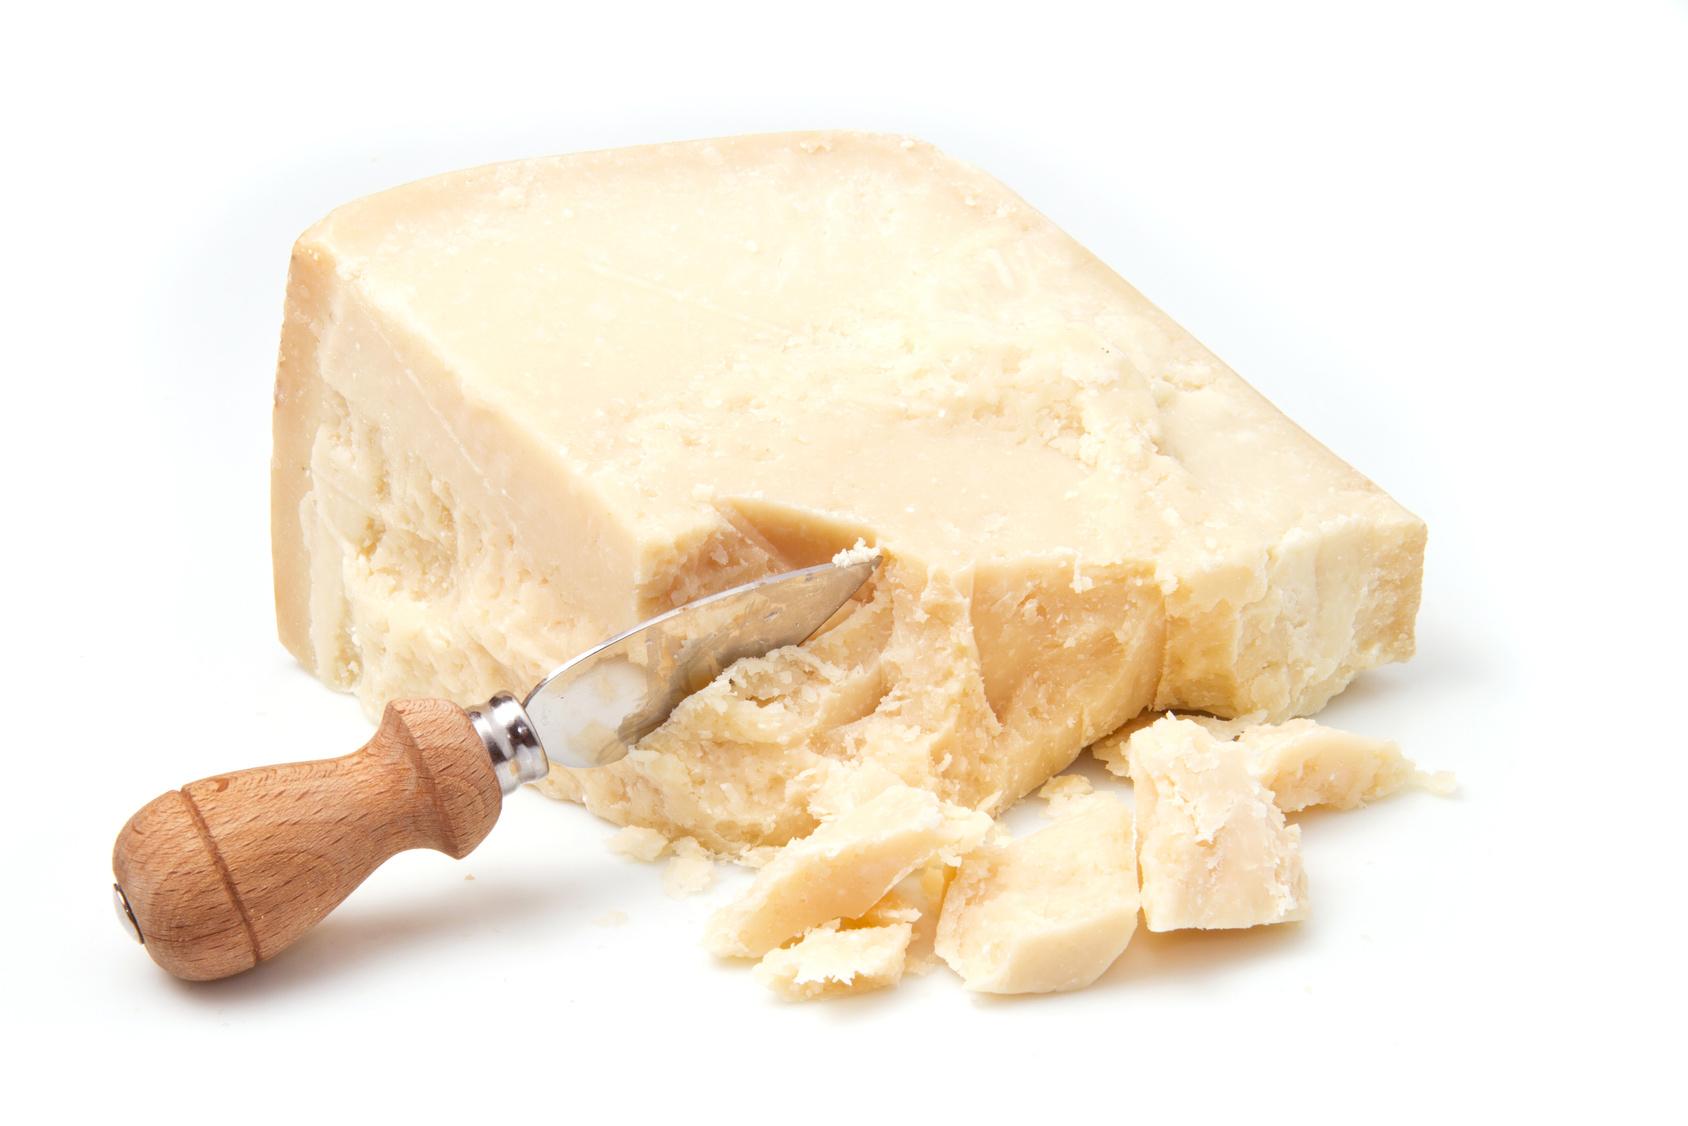 Parmesan-cheese-2